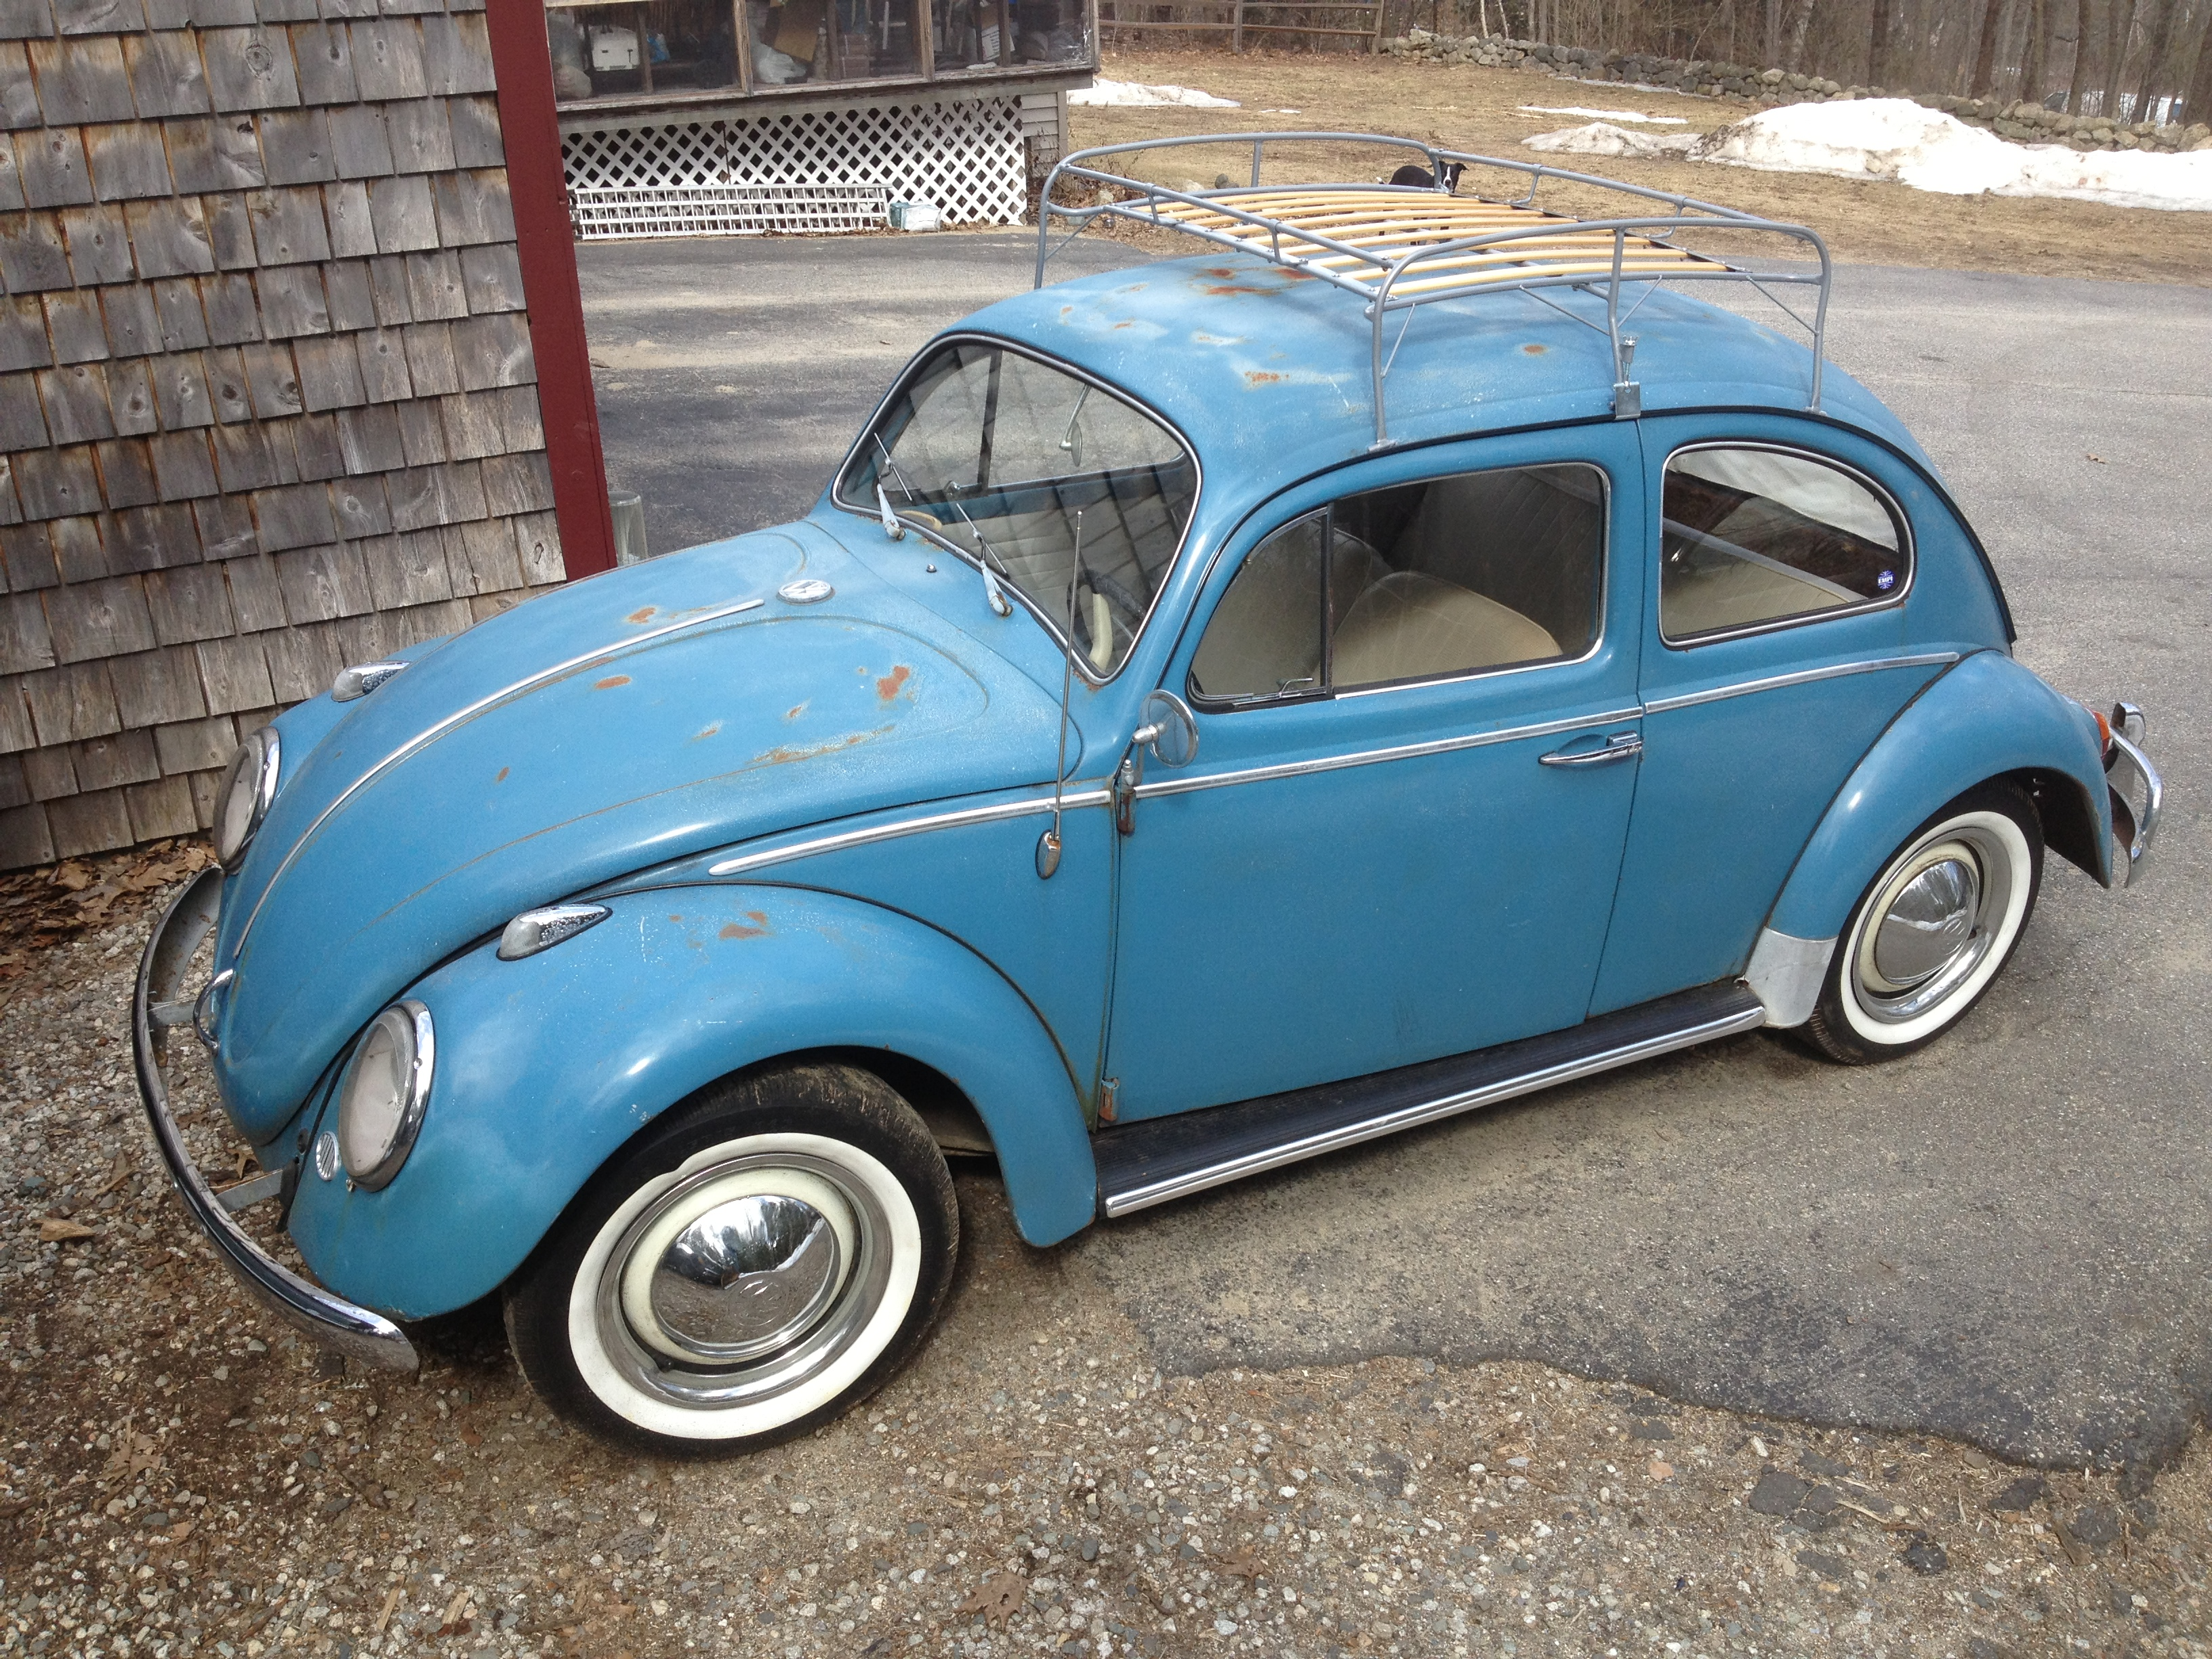 beetle moibibiki pictures craigslist modifications convertible volkswagen price